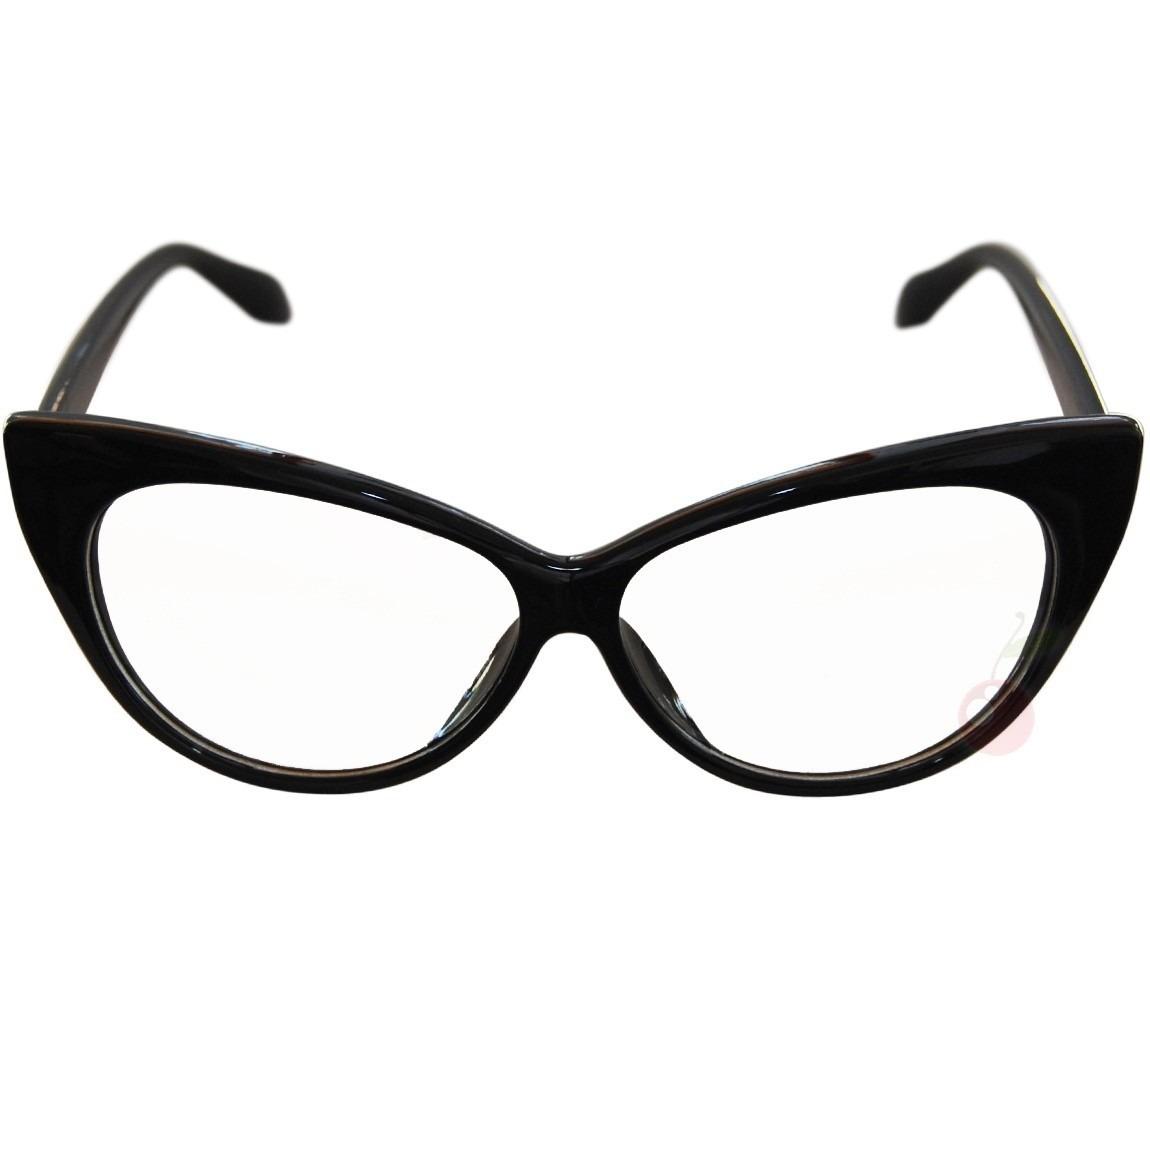 Lentes Gafas Pin Up Cat (rockabilly) Eye Cat 50s Vintage